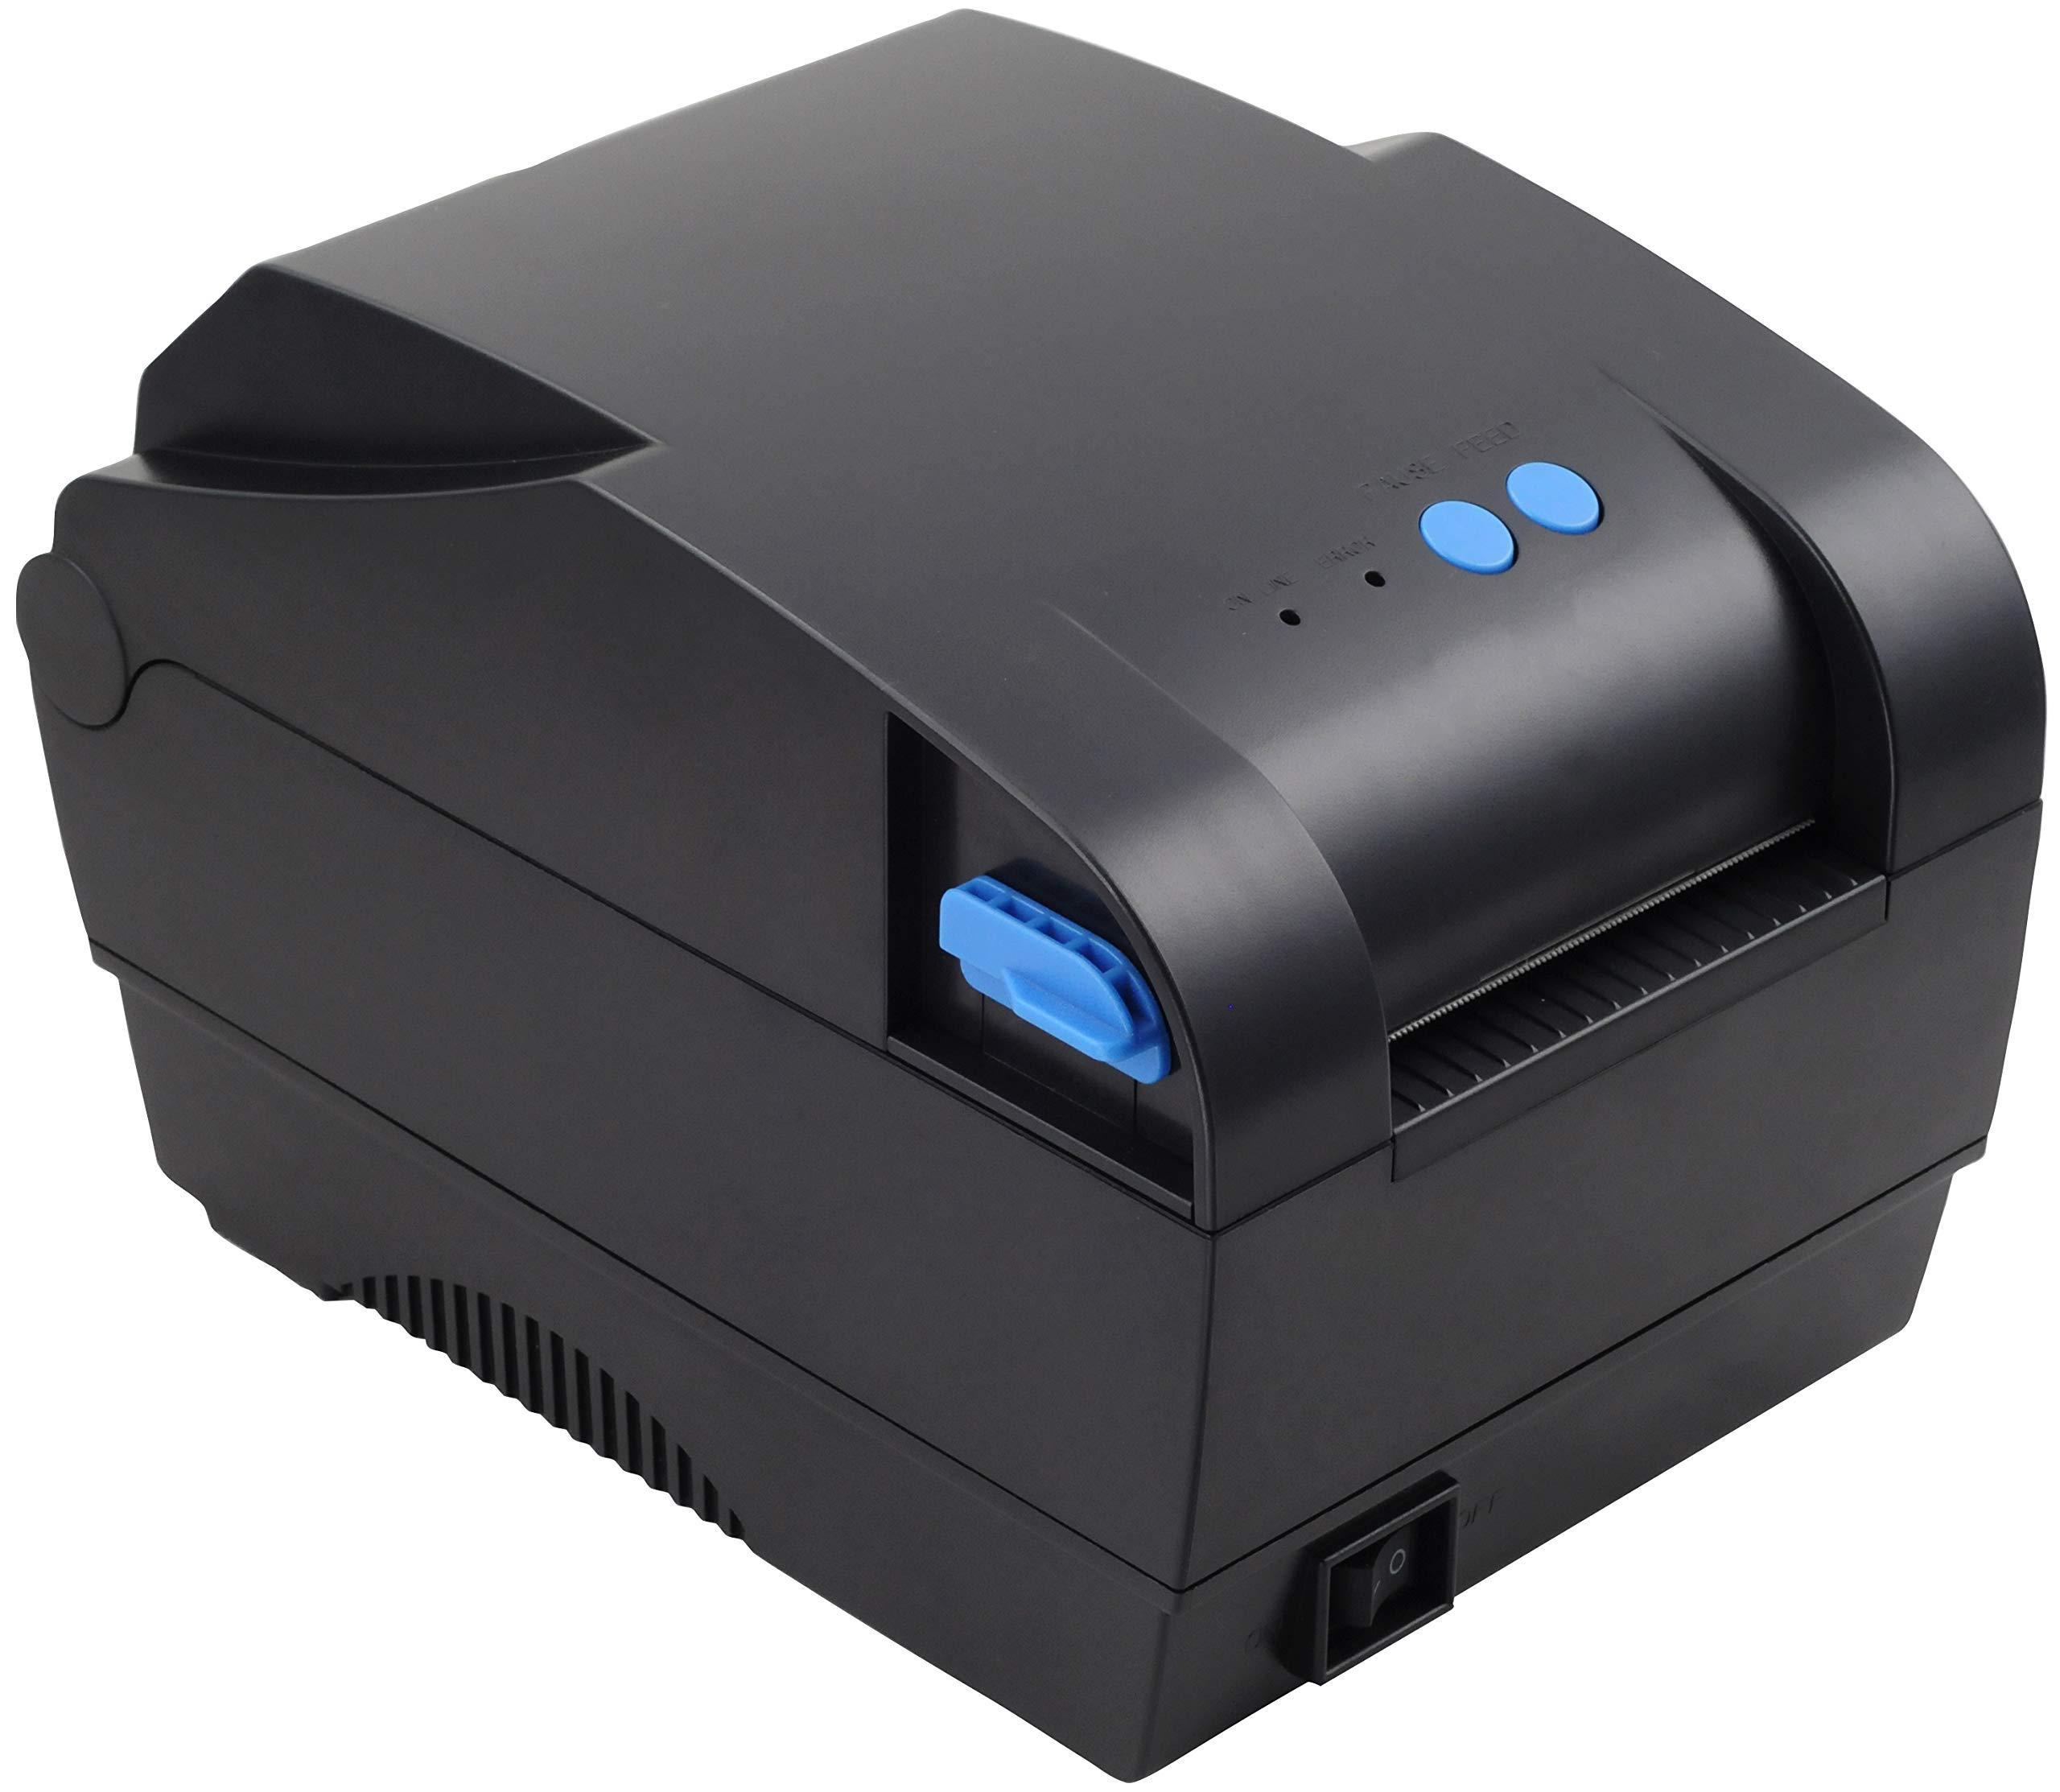 Xprinter XP-365B 80mm Thermal Label Printer,Thermal Barcode Printer, USB 2.0 Interface, Black